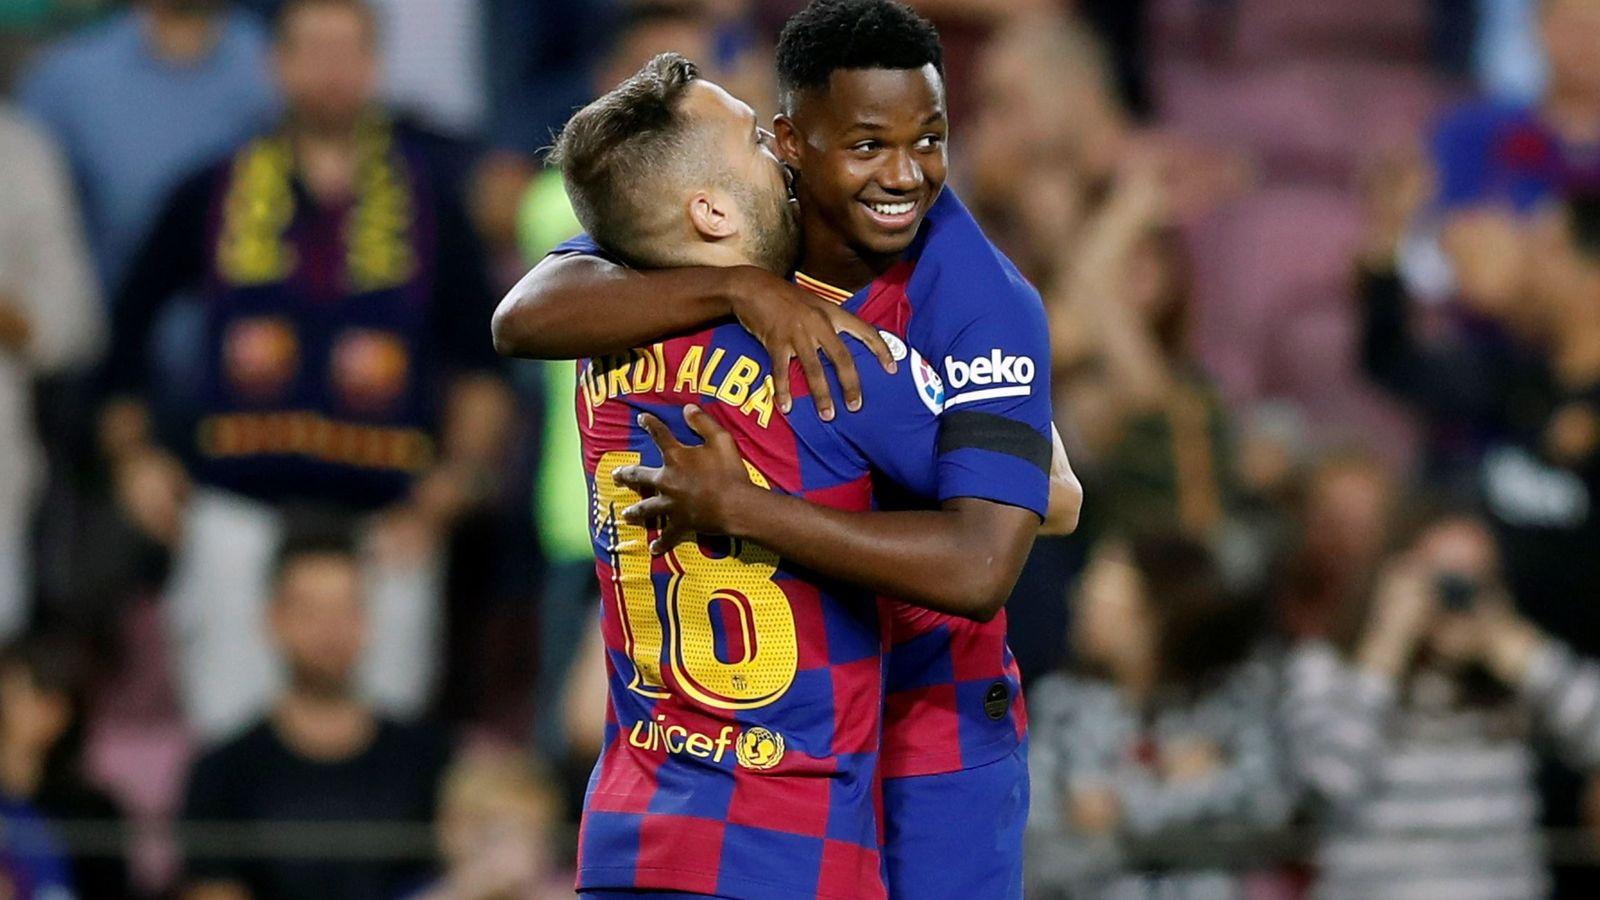 Foto: Jordi Alba abraza a Ansu Fati tras marcar el gol al Valencia. (Efe)